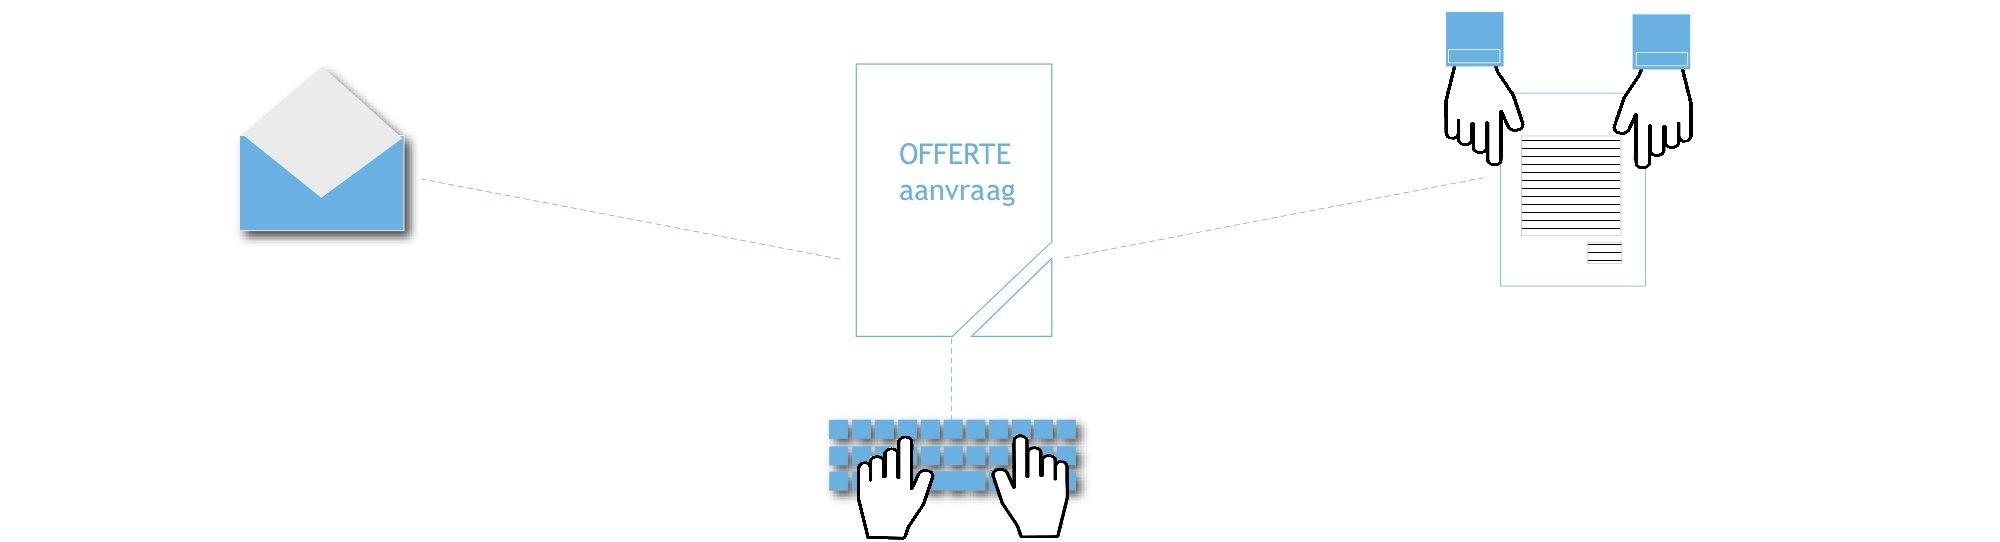 Ducotex offerte banner